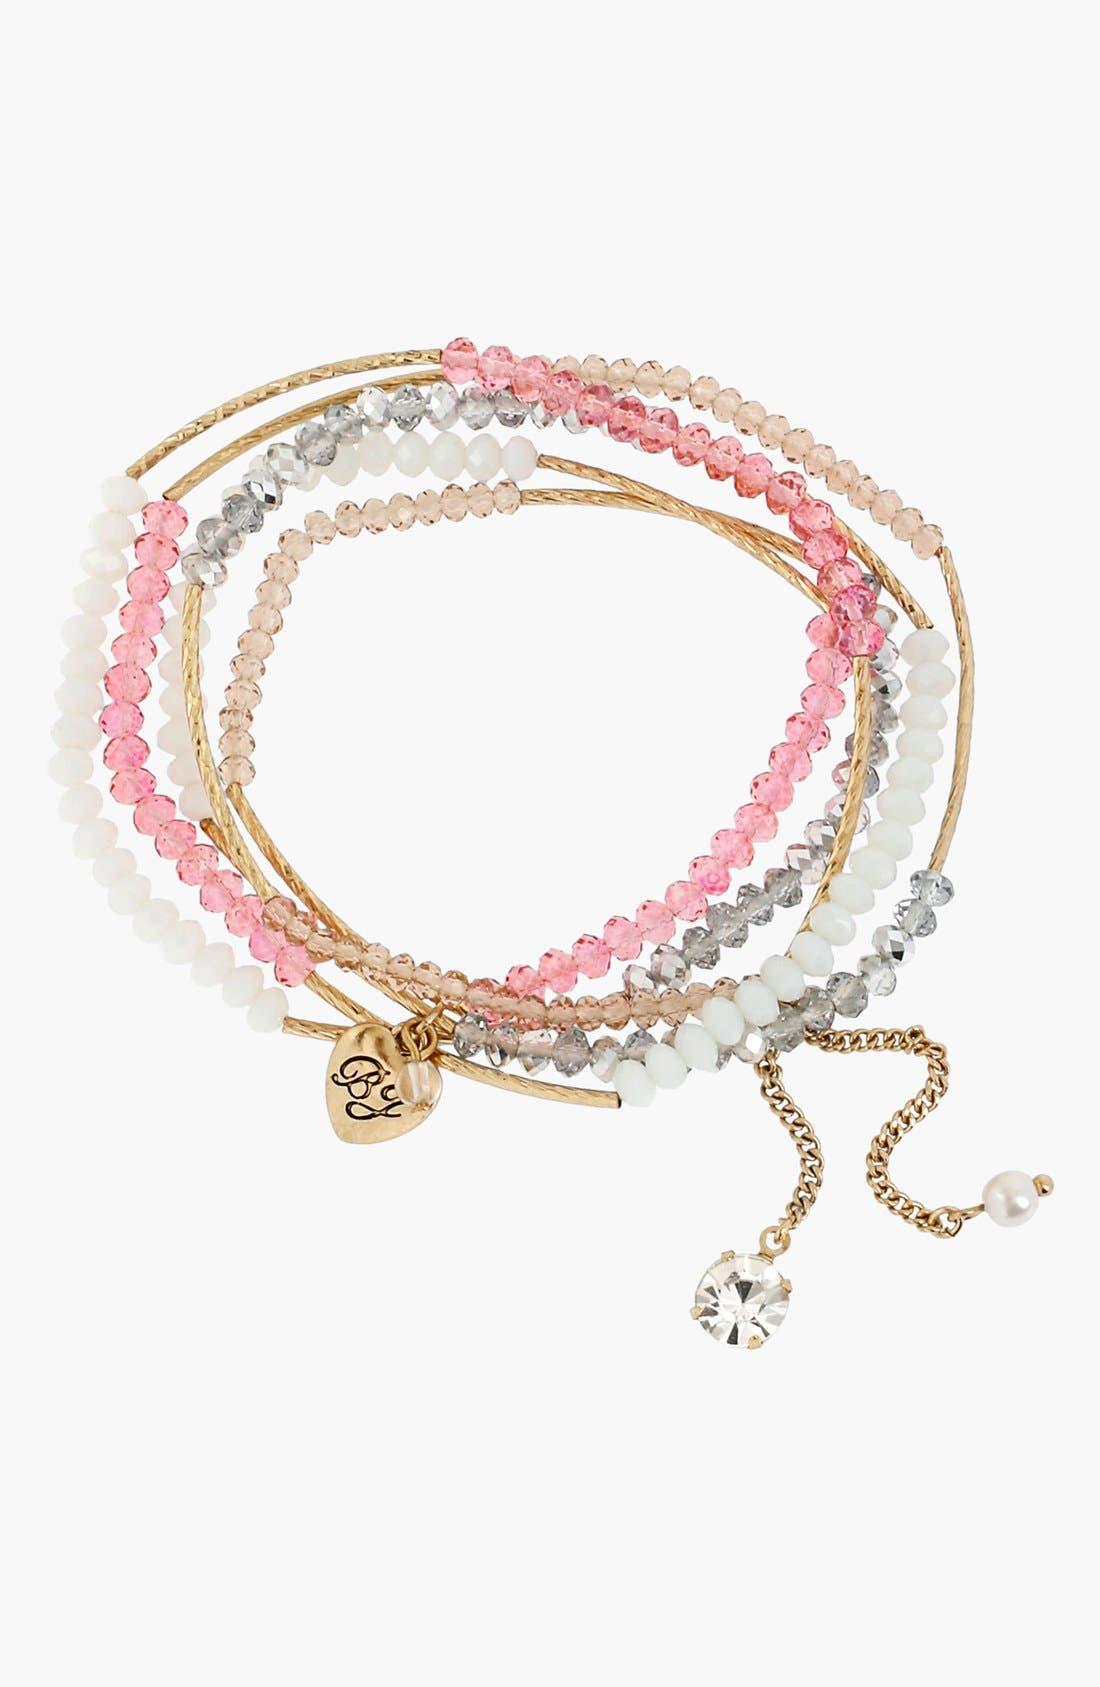 Main Image - Betsey Johnson 'Paris' Multi Row Beaded Charm Bracelet